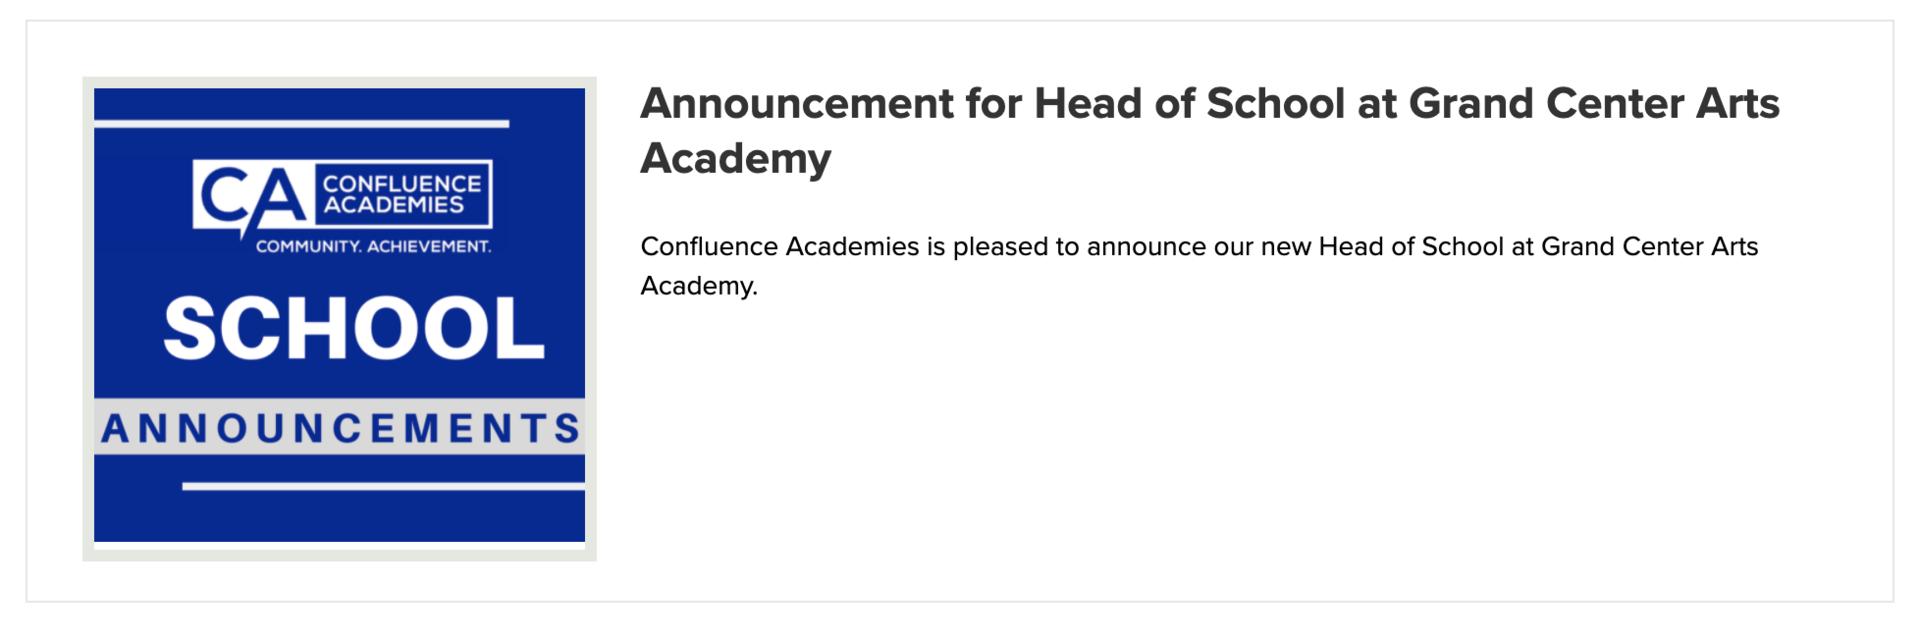 School Announcements Confluence